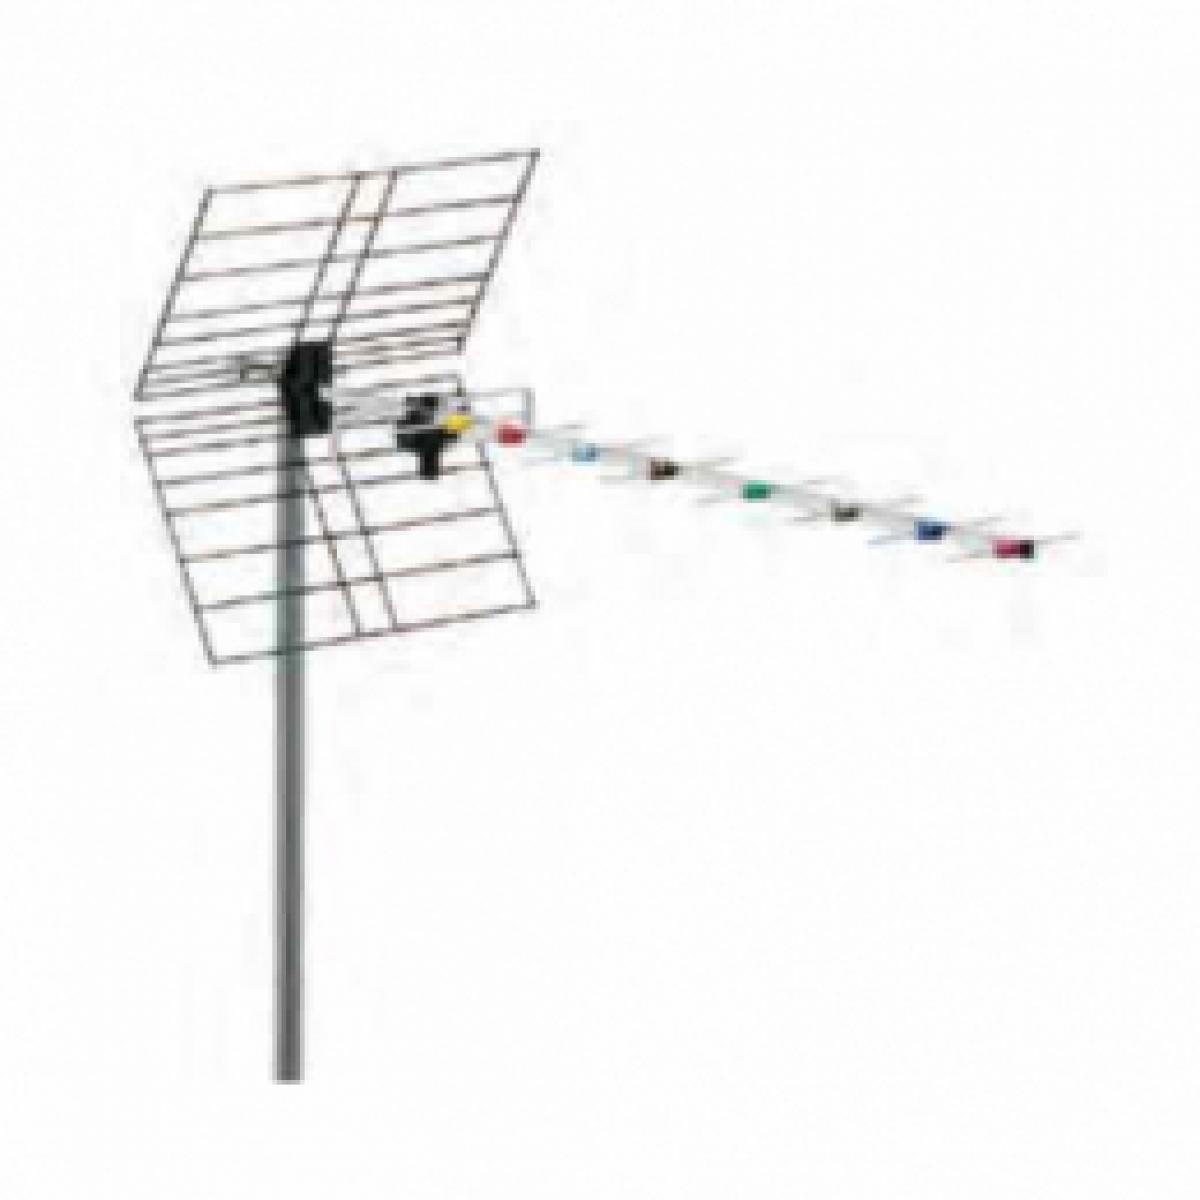 Antenna 10rd45f 219546 fracarro